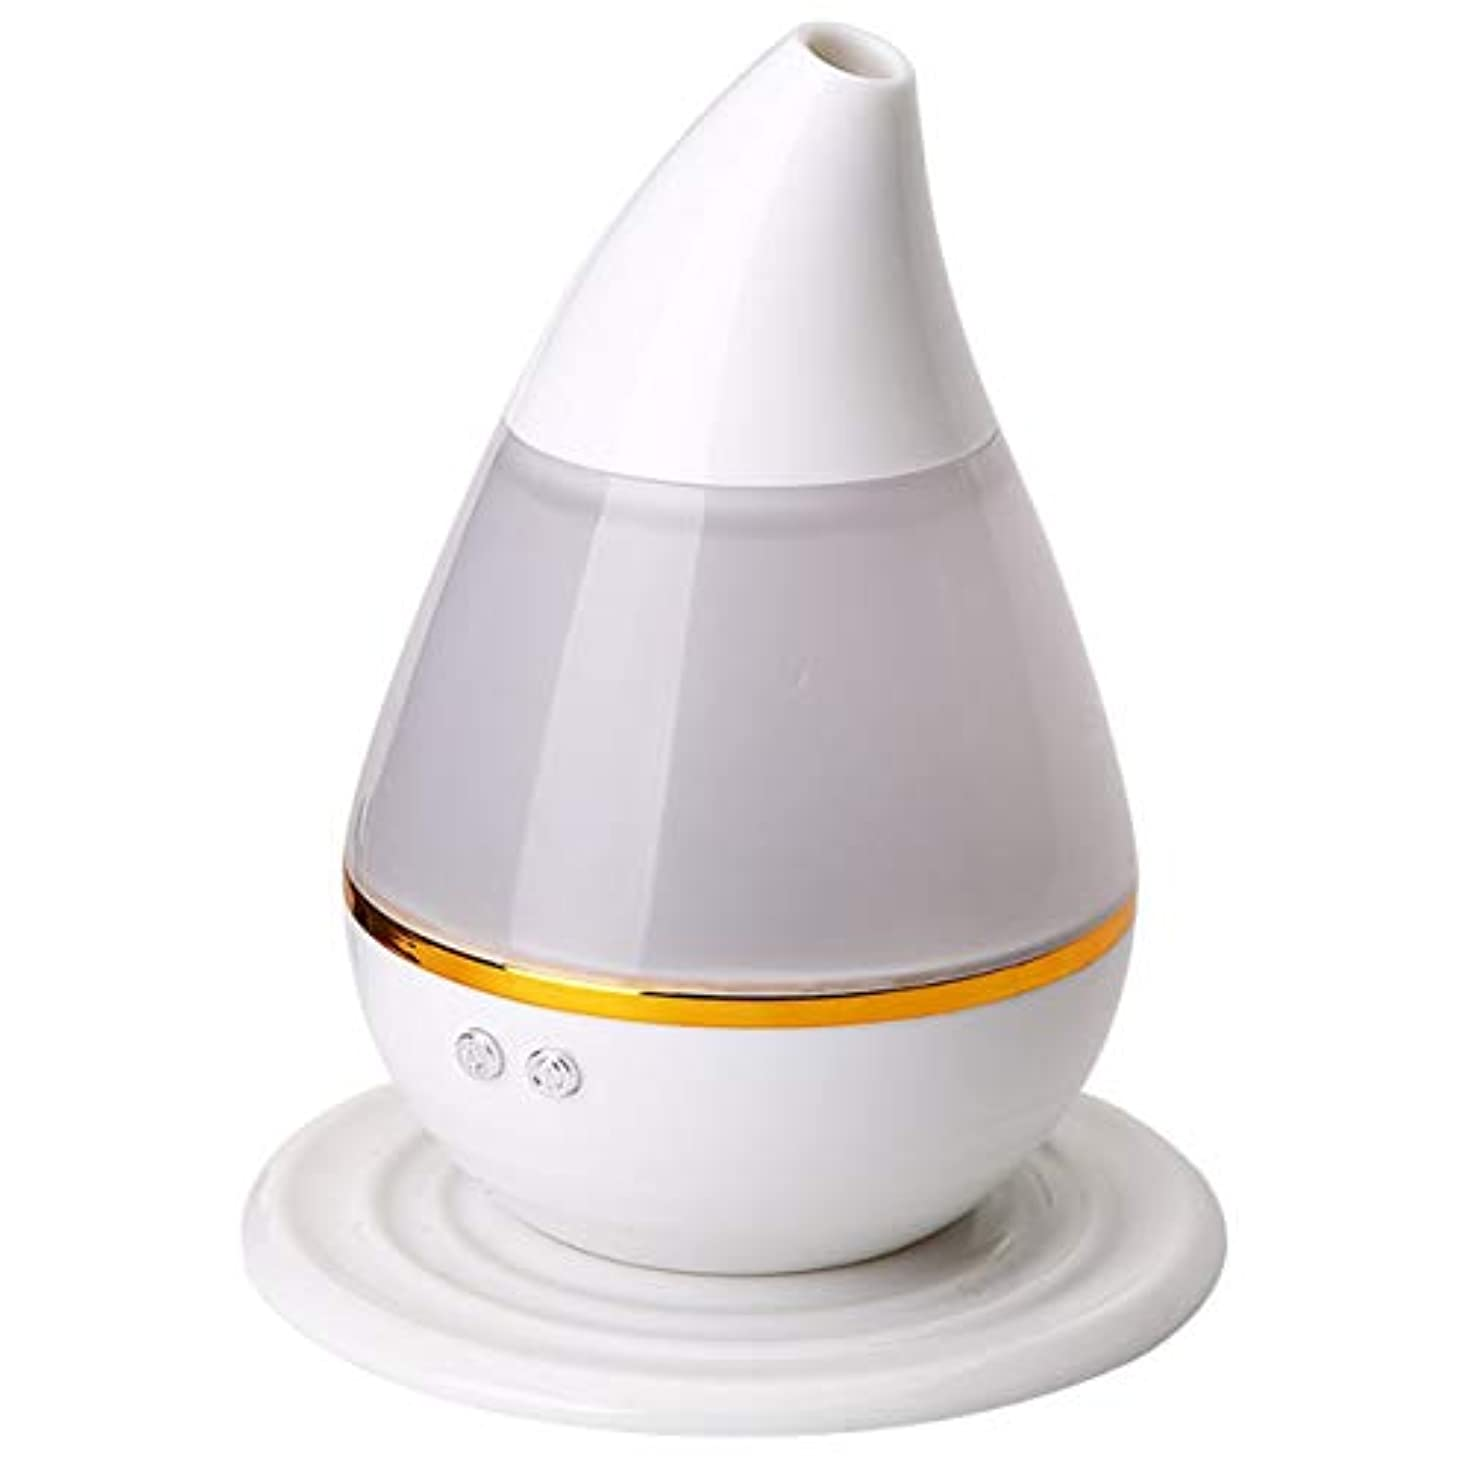 Saikogoods 超静音ポータブル超音波加湿器 3D効果ガラスの夜ライトアロマディフューザーベストギフト 白